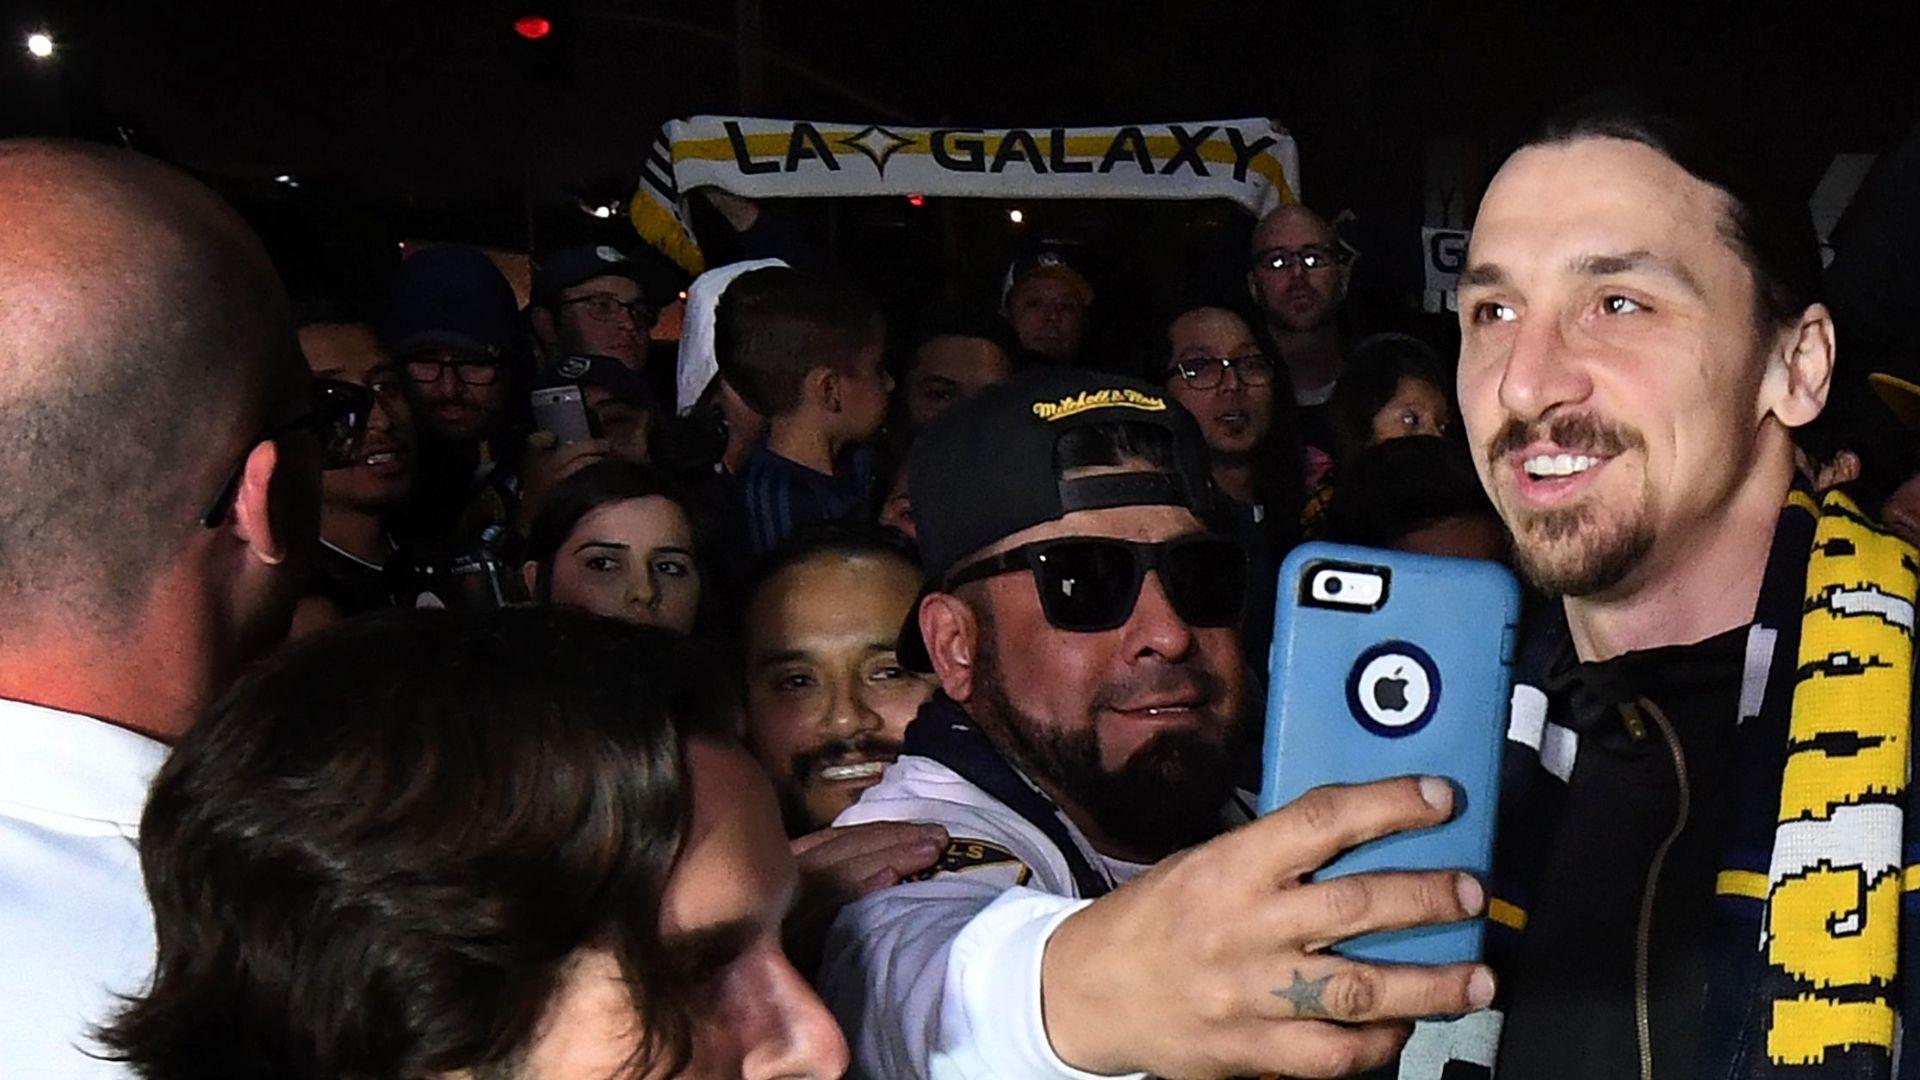 https://secure.espncdn.com/combiner/i?img=/media/motion/ESPNi/2018/0330/int_180330_Ibrahimovic_arrives_in_LA/int_180330_Ibrahimovic_arrives_in_LA.jpg